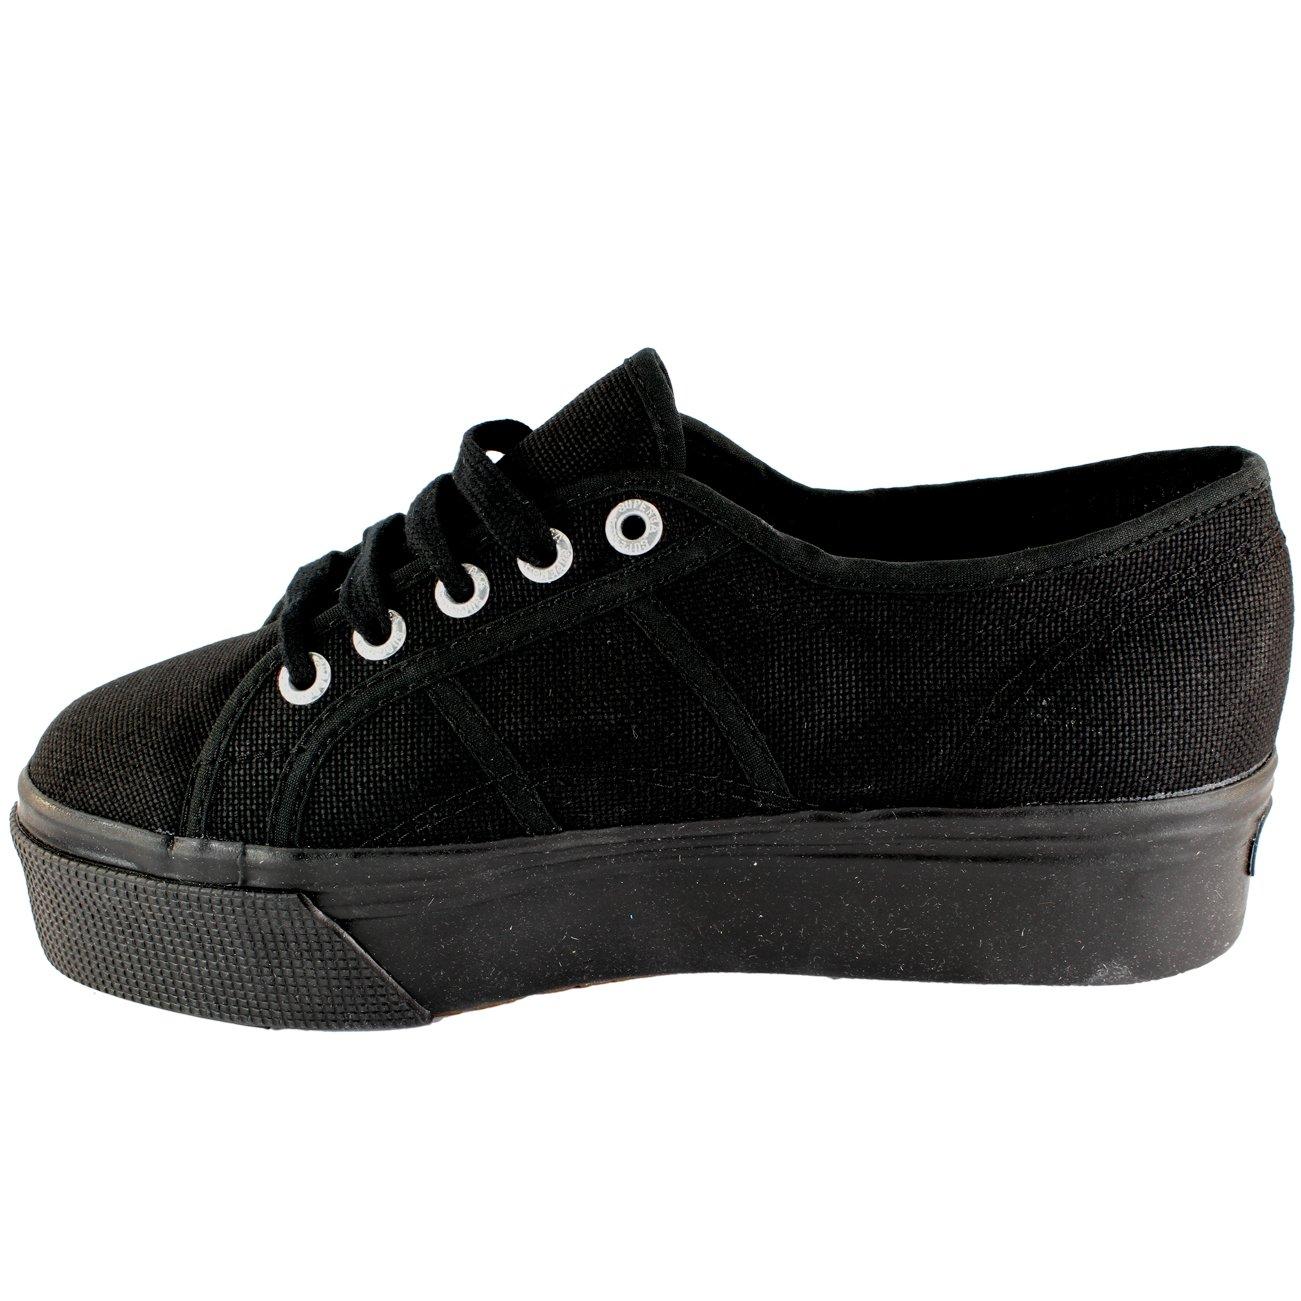 Damen Schuhe Superga 2790 Leinwand Leinwand Leinwand Klobig Sole Plimsoll Trainers 792ce7